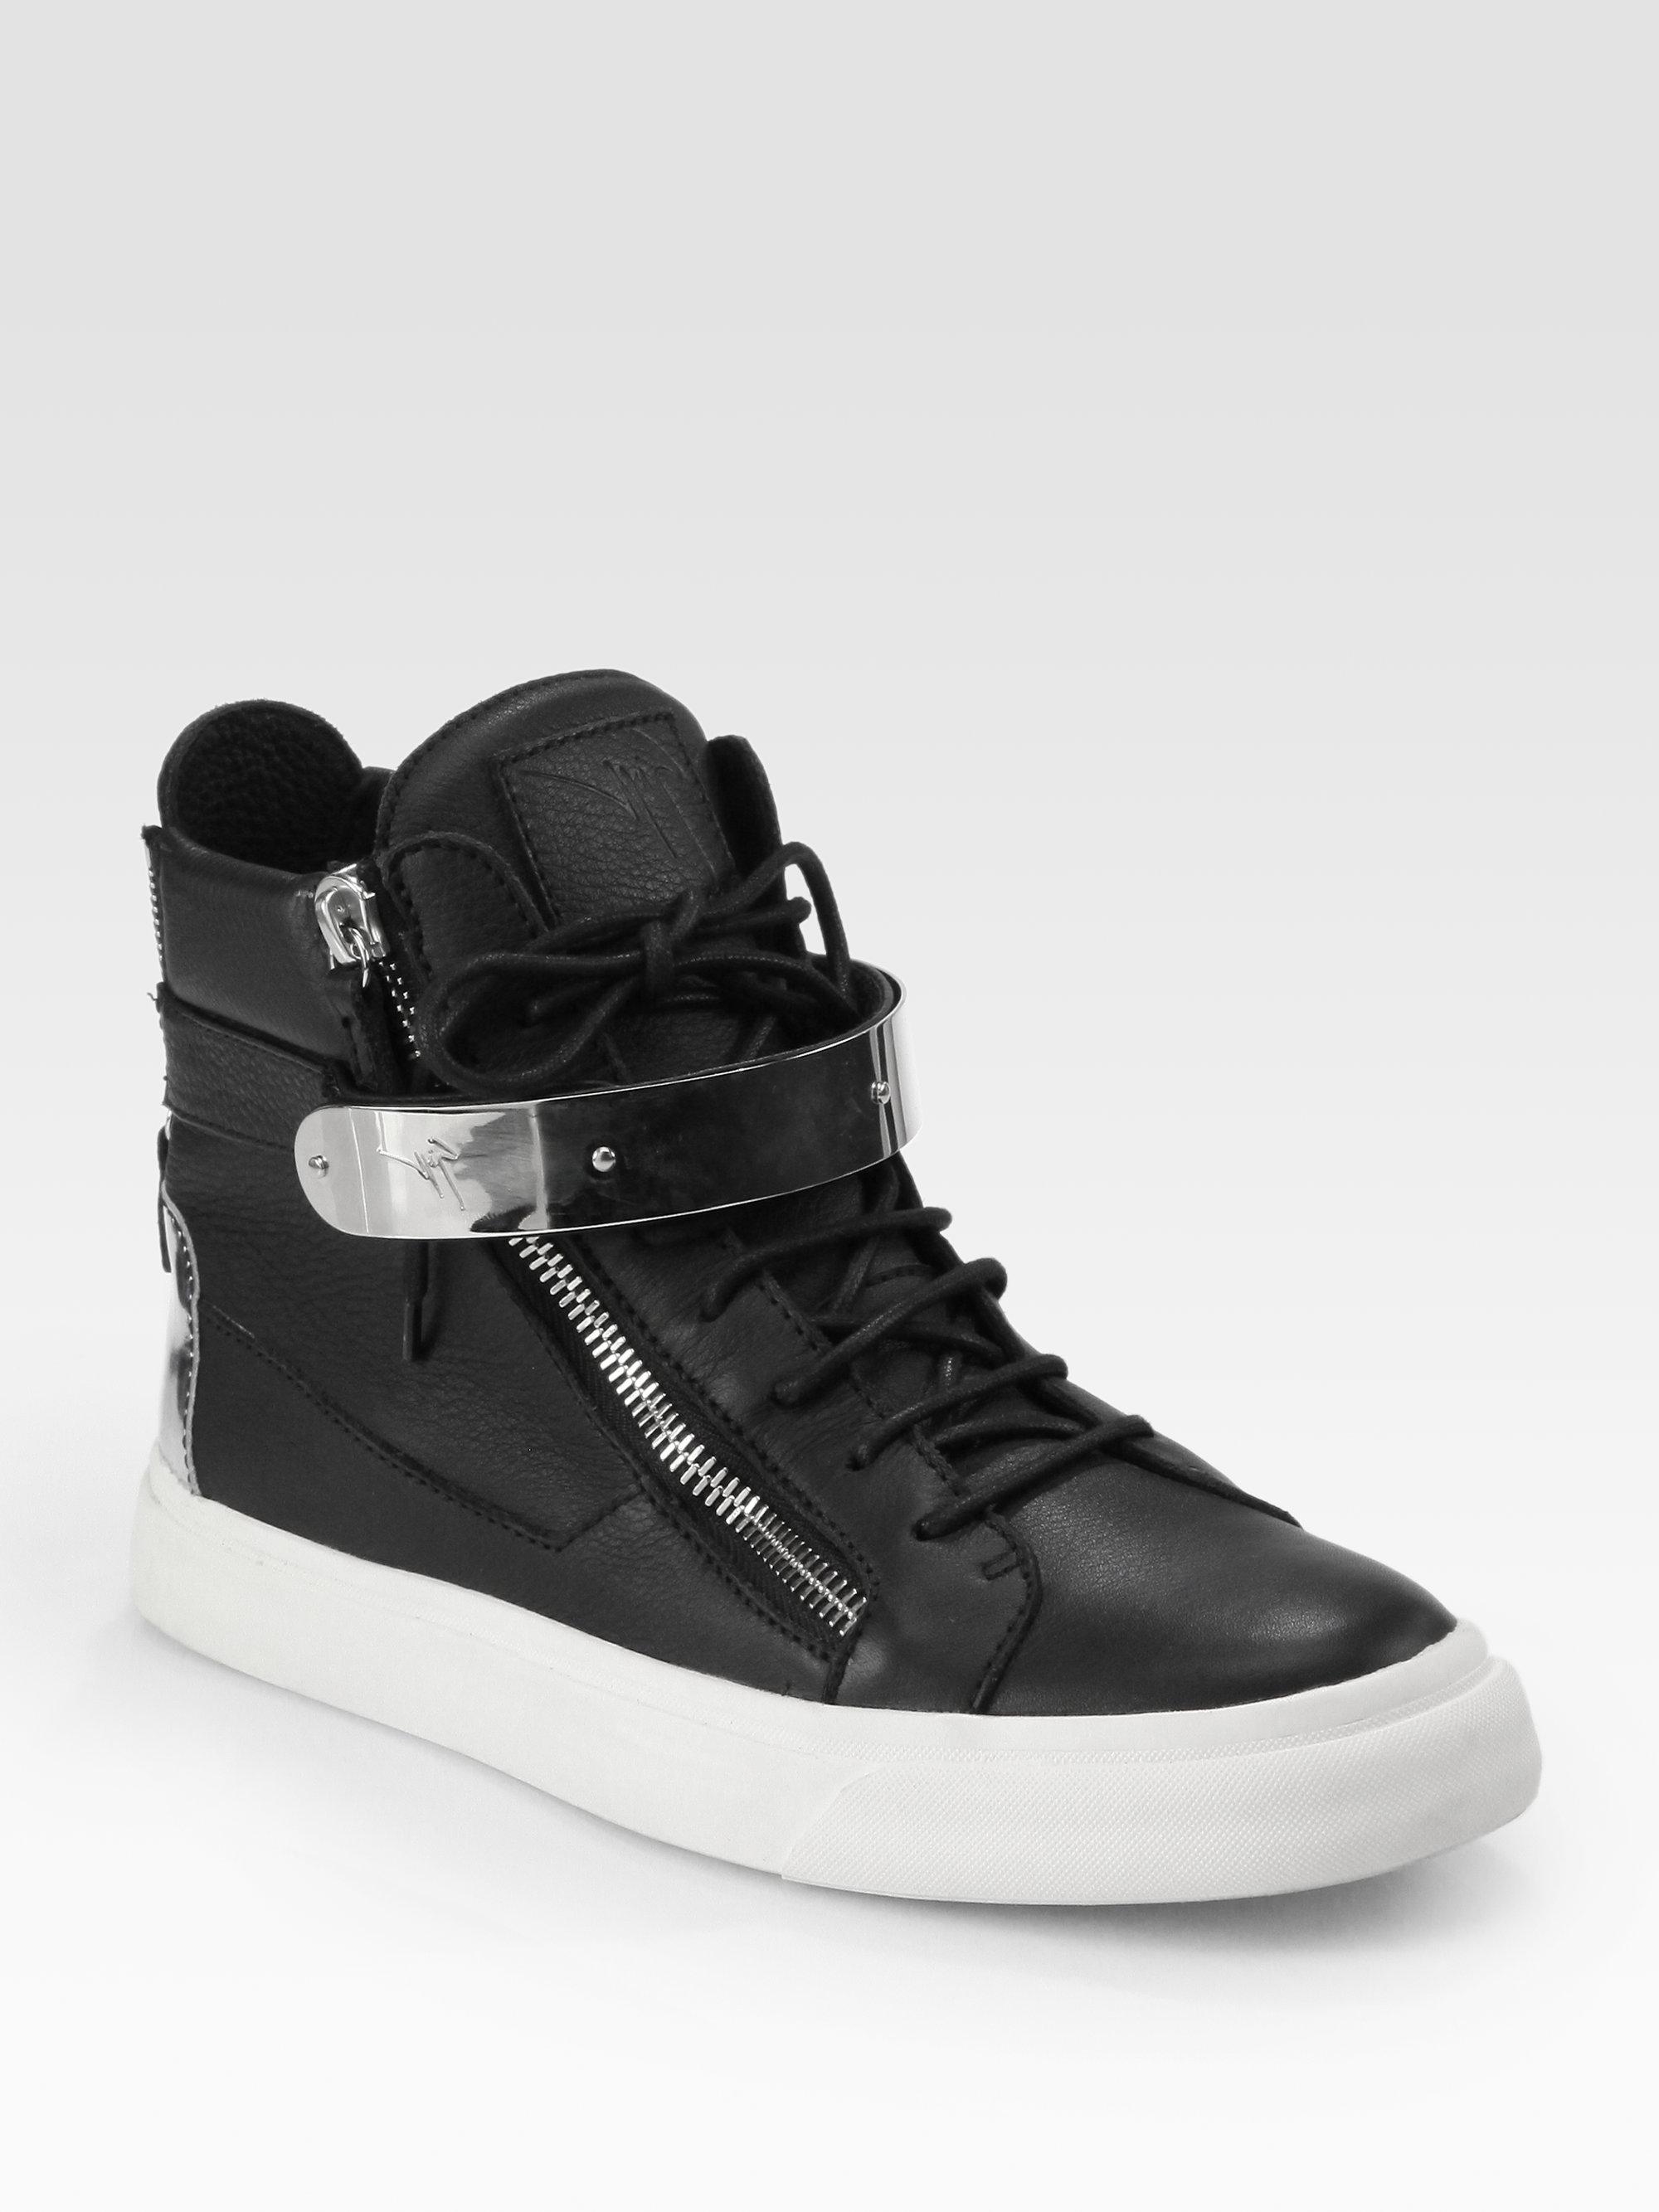 giuseppe zanotti black suede double zipper boots